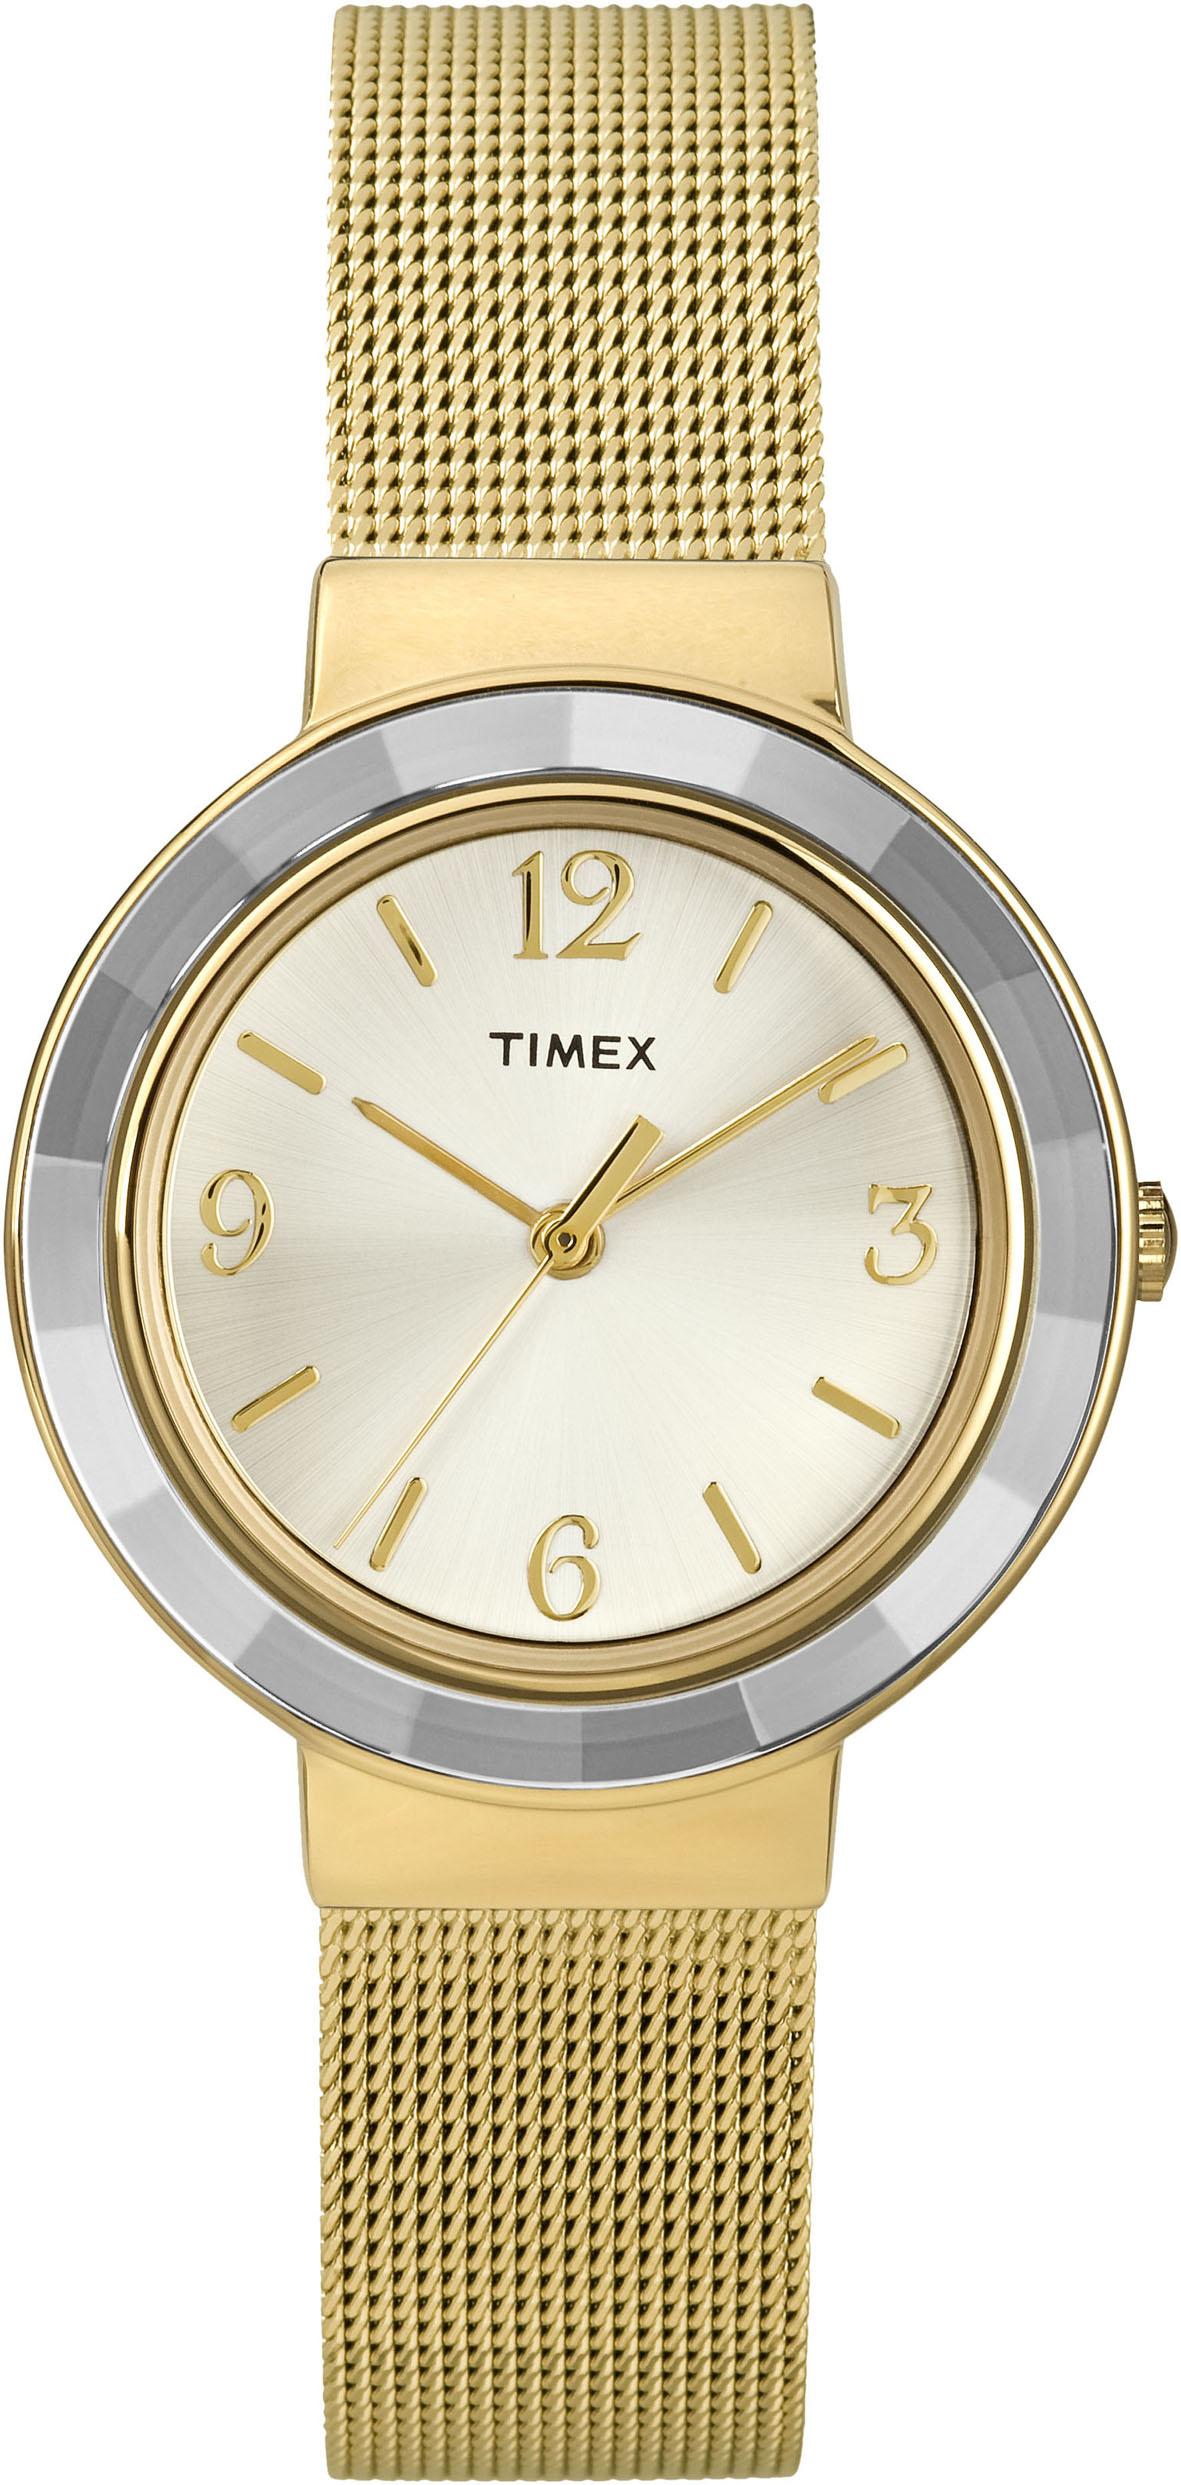 TIMEX Women's Dress Mesh Bracelet